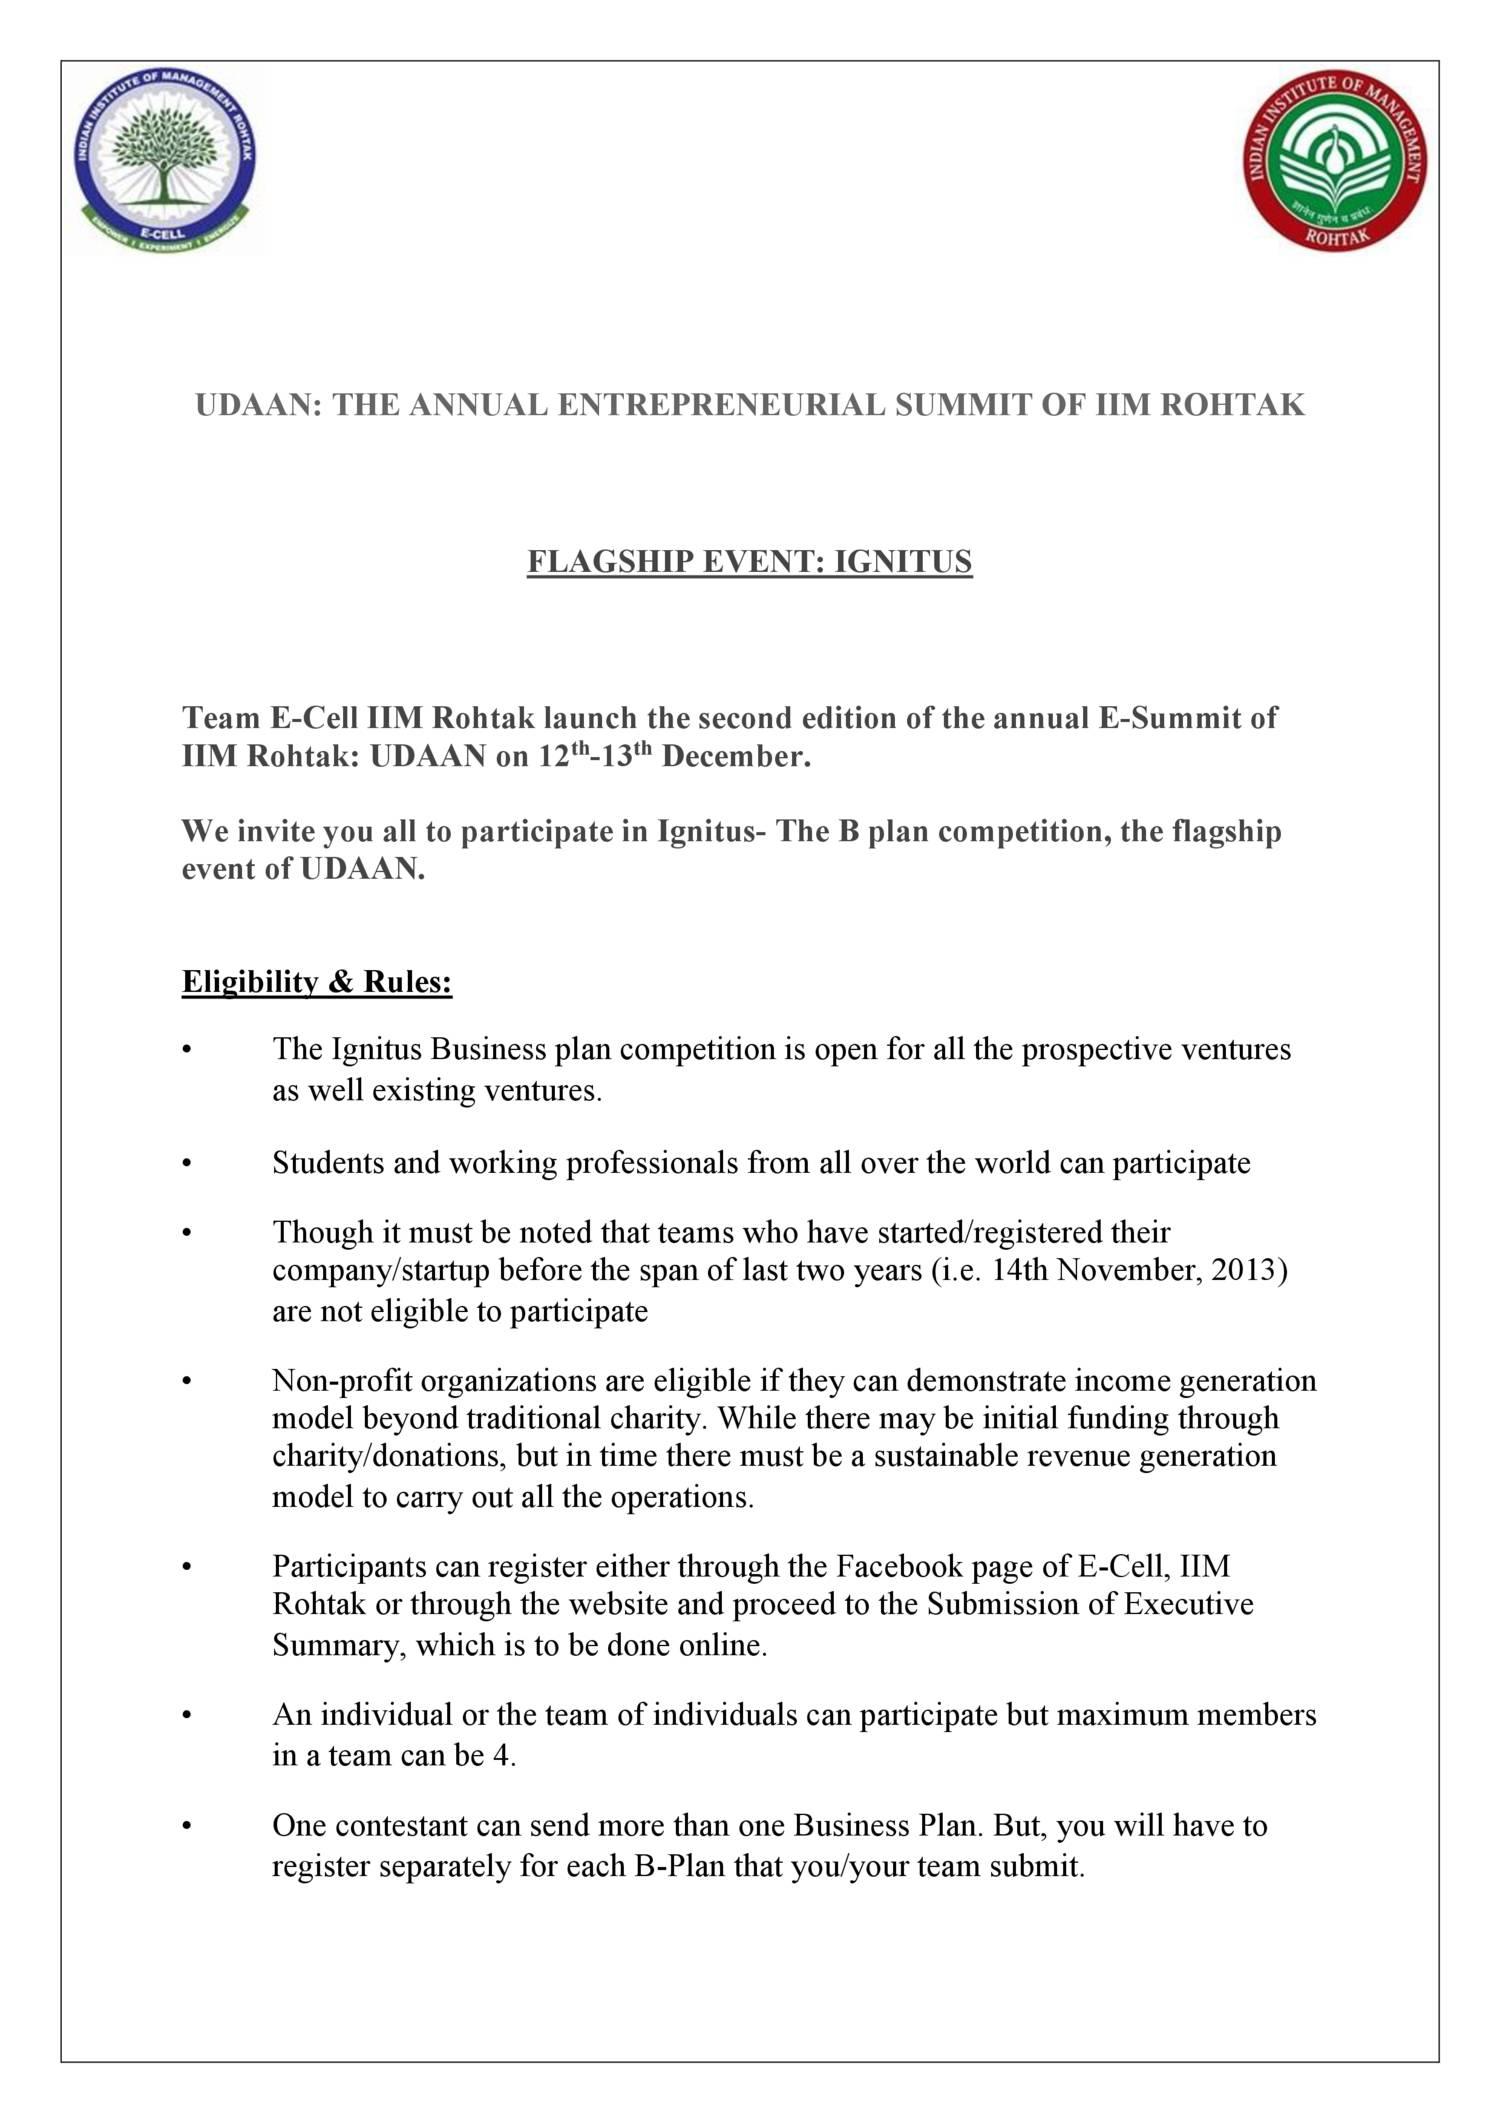 Essays for iim pdf viewer